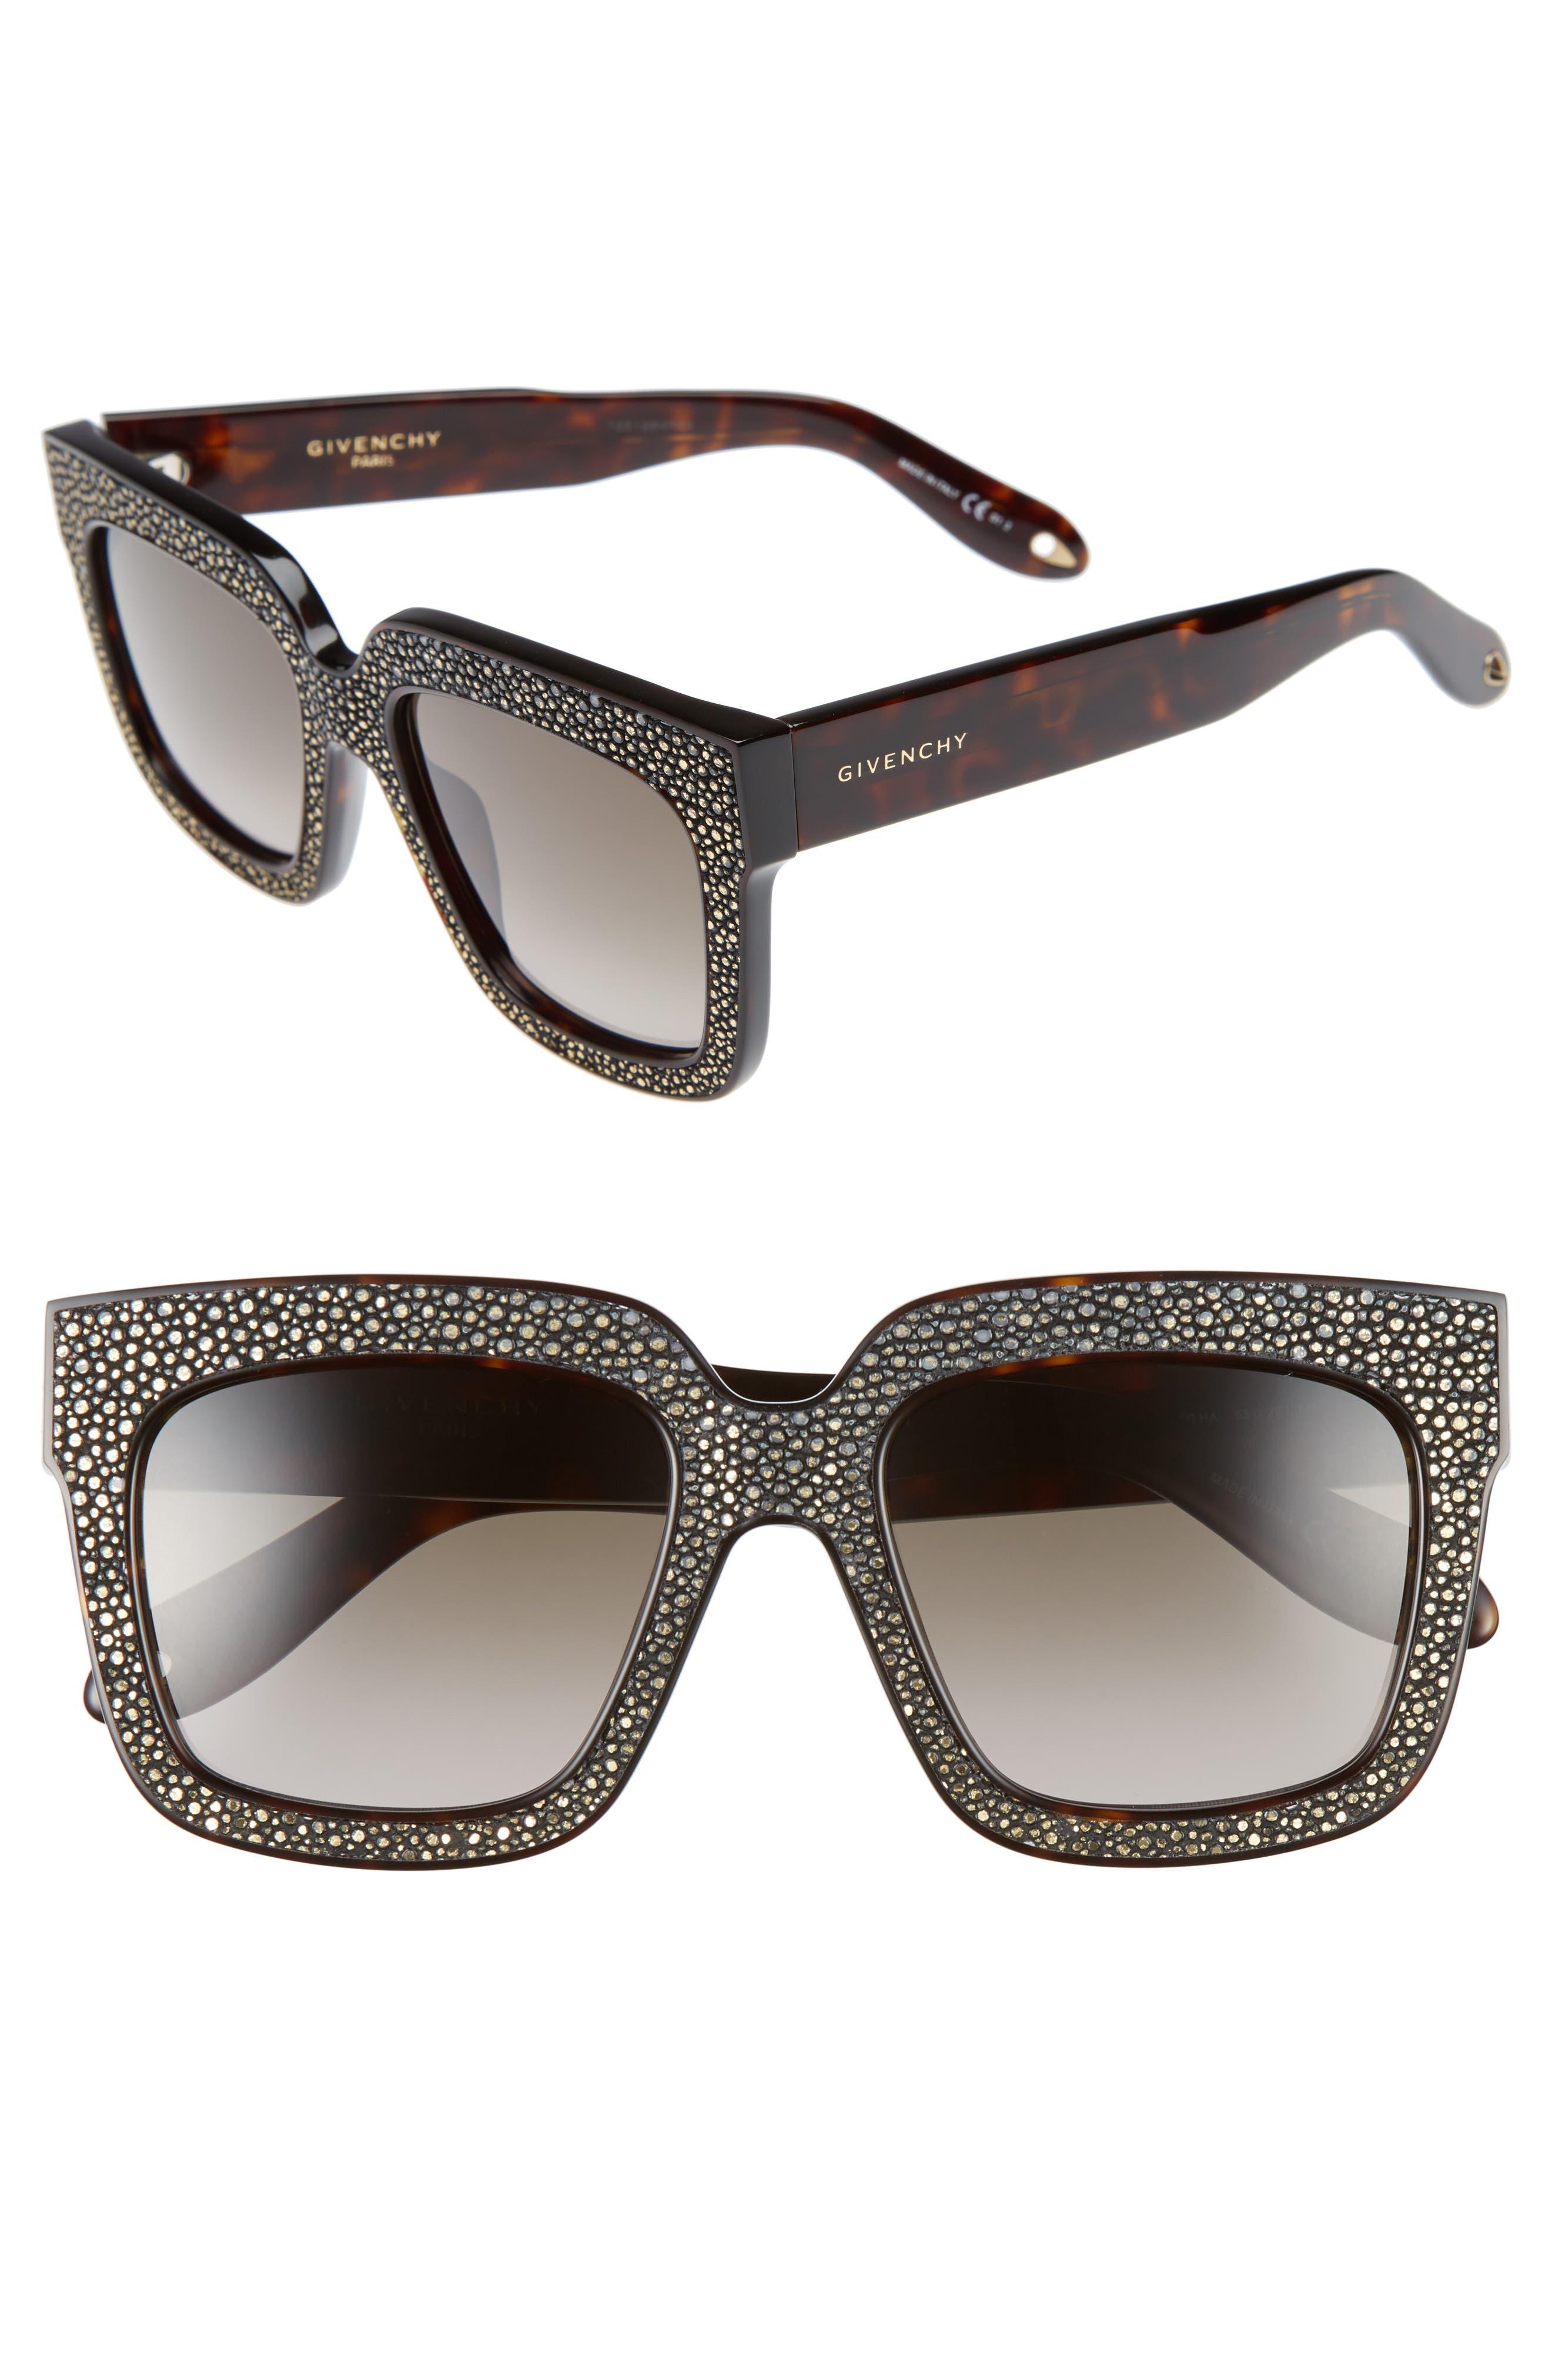 53mm Square Sunglasses,                         Main,                         color, Gold